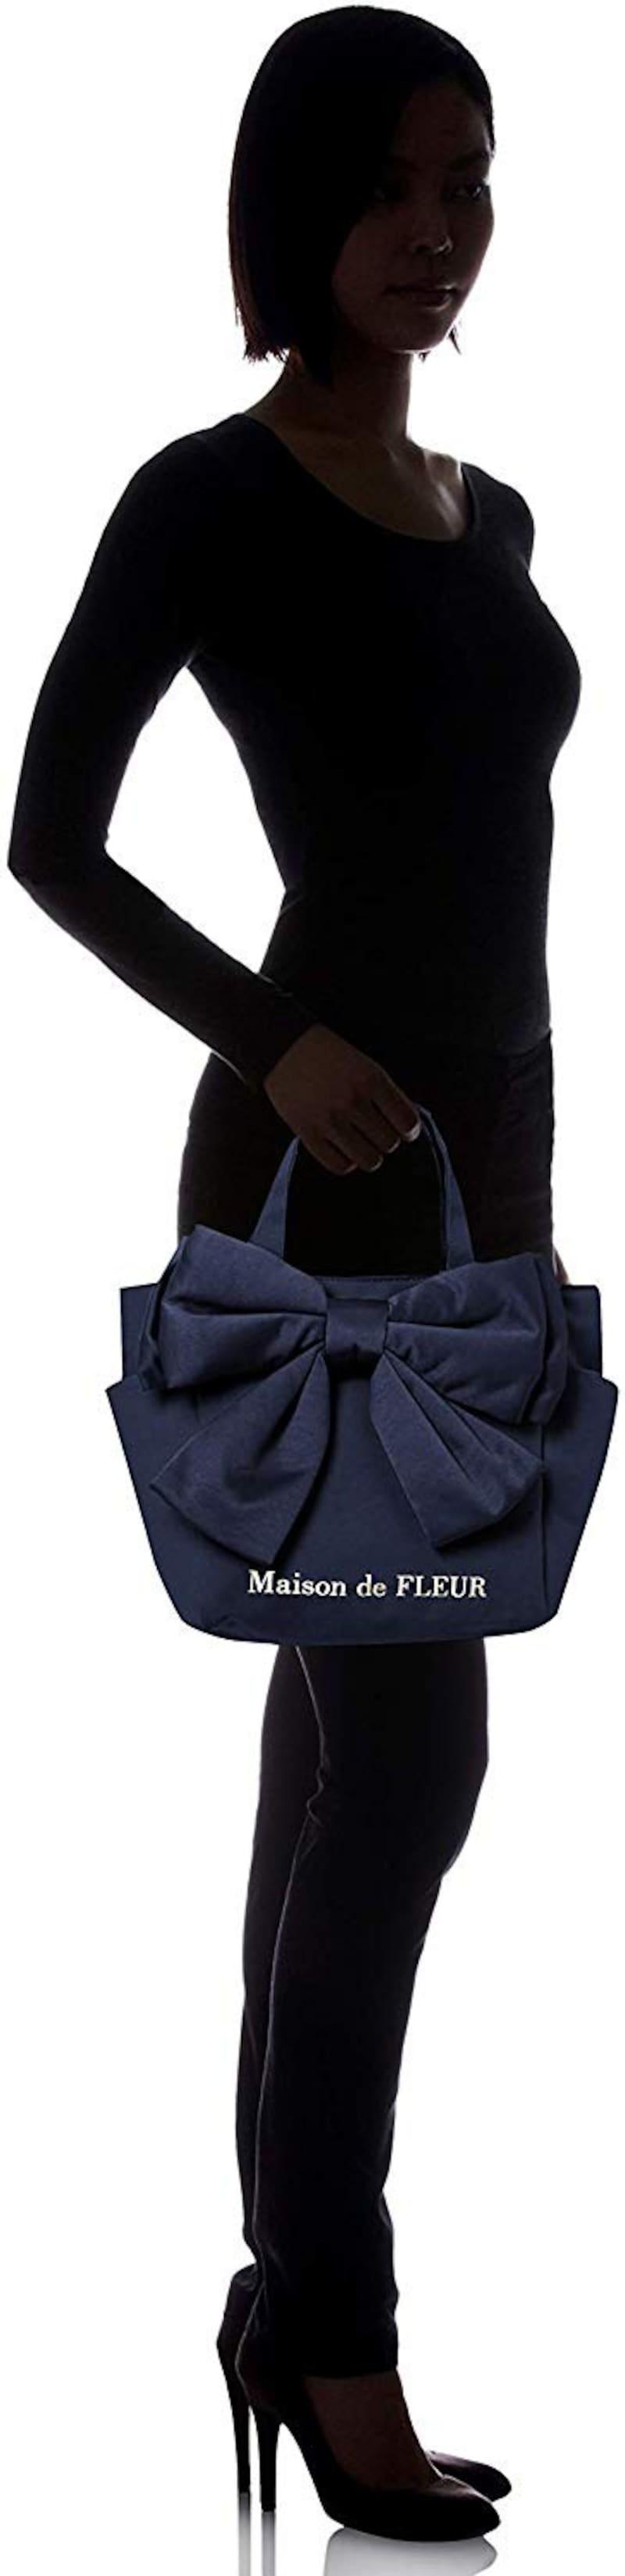 Maison de FLEUR(メゾンドフルール),ビックリボンSトートバッグ,8A93F0J2400